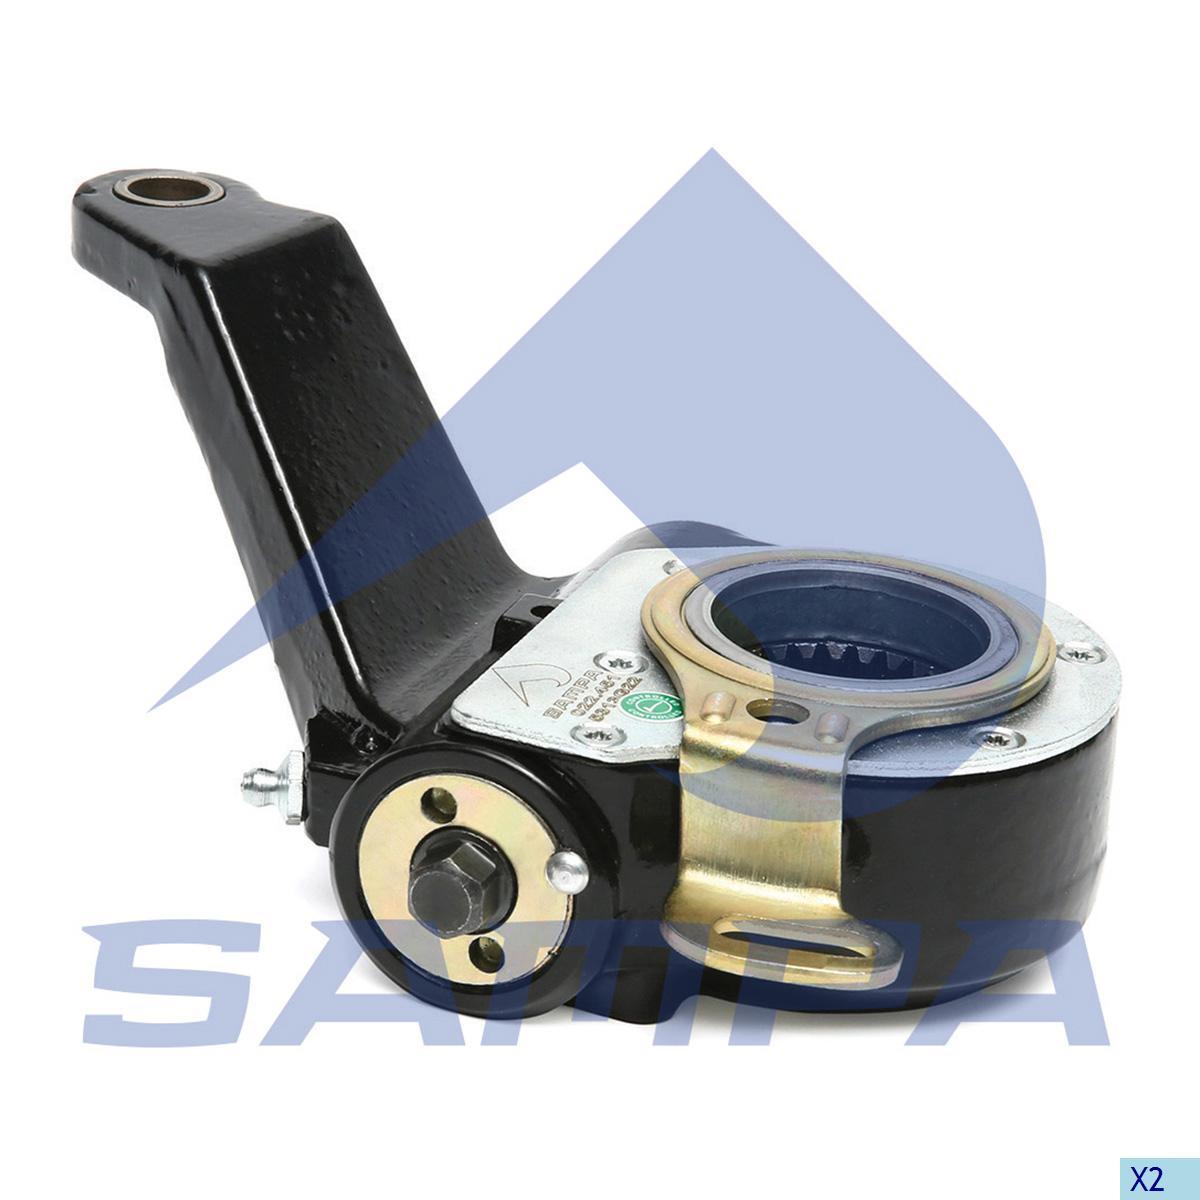 Brake Slack Adjuster, Man, Brake